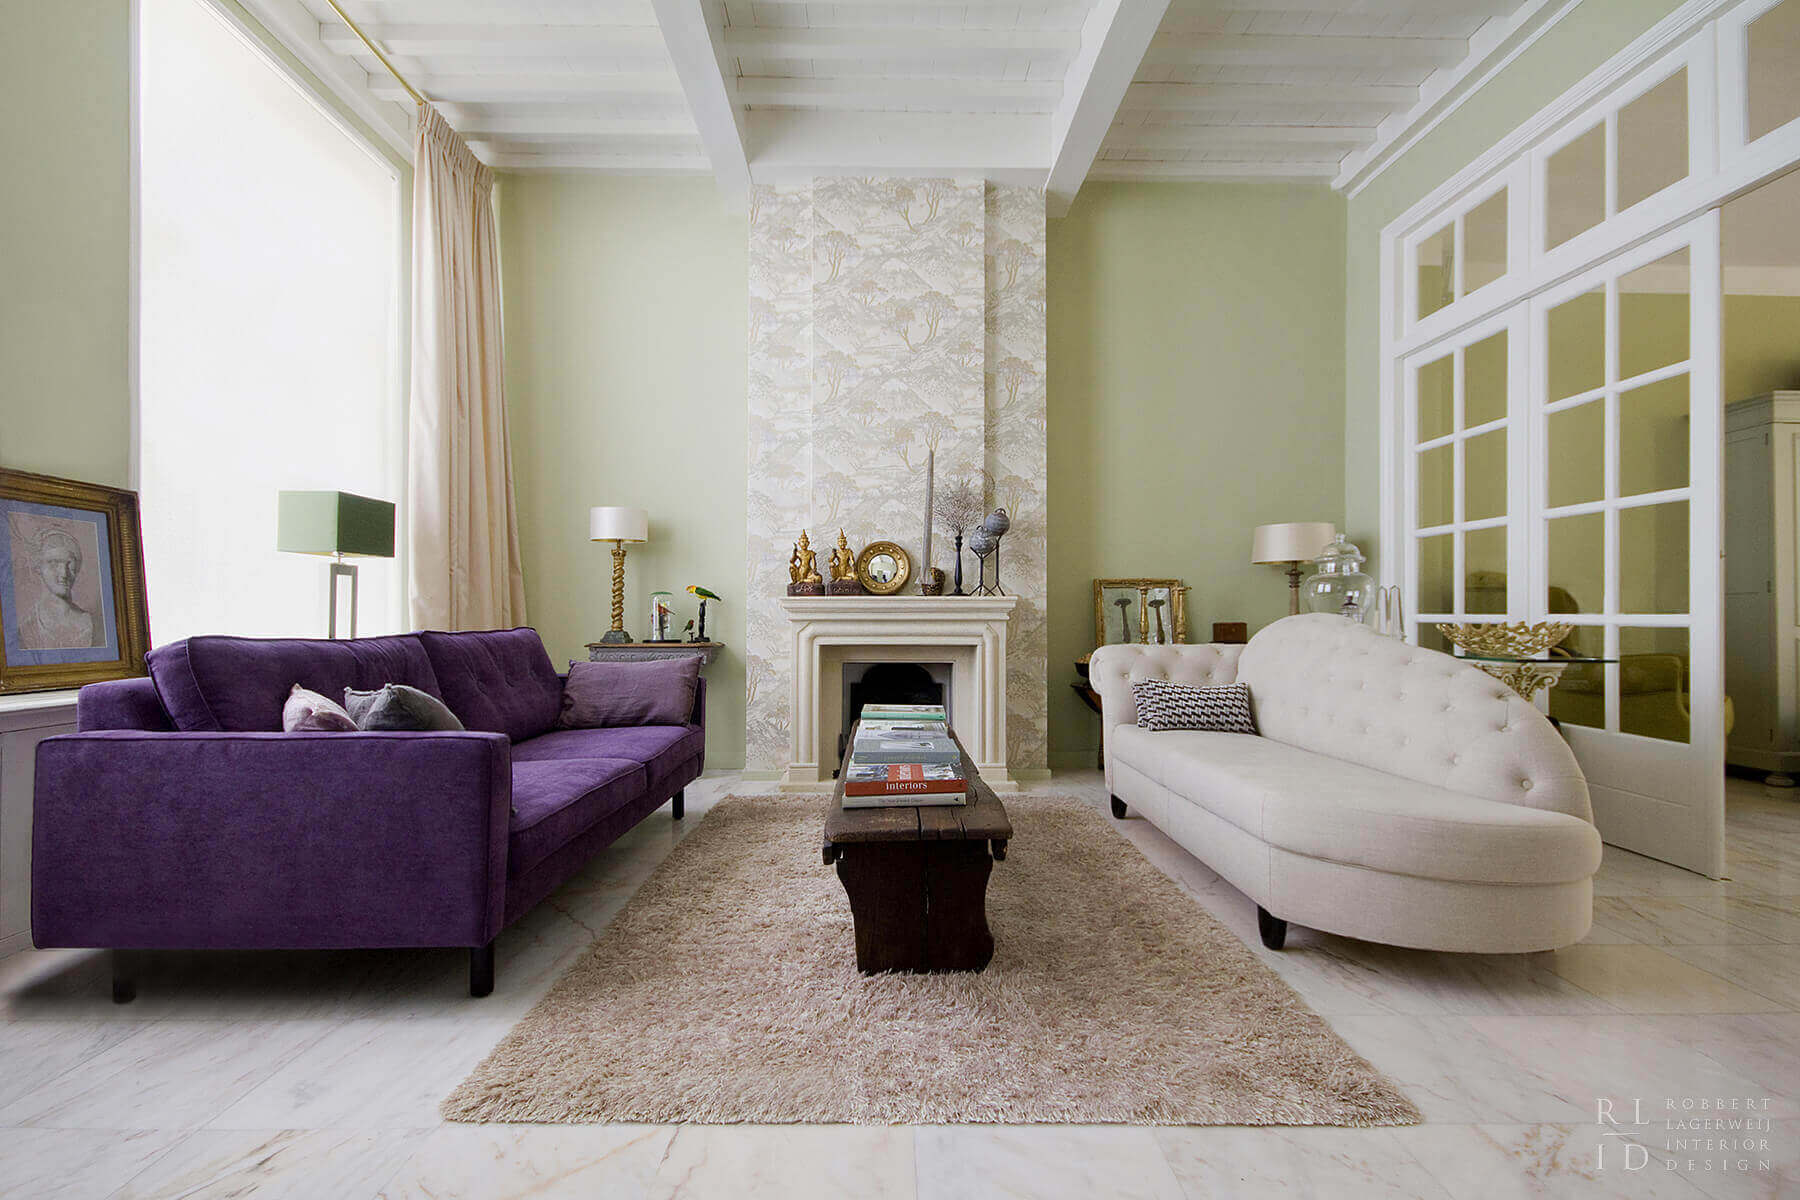 Binnenhuis architect inspiratie